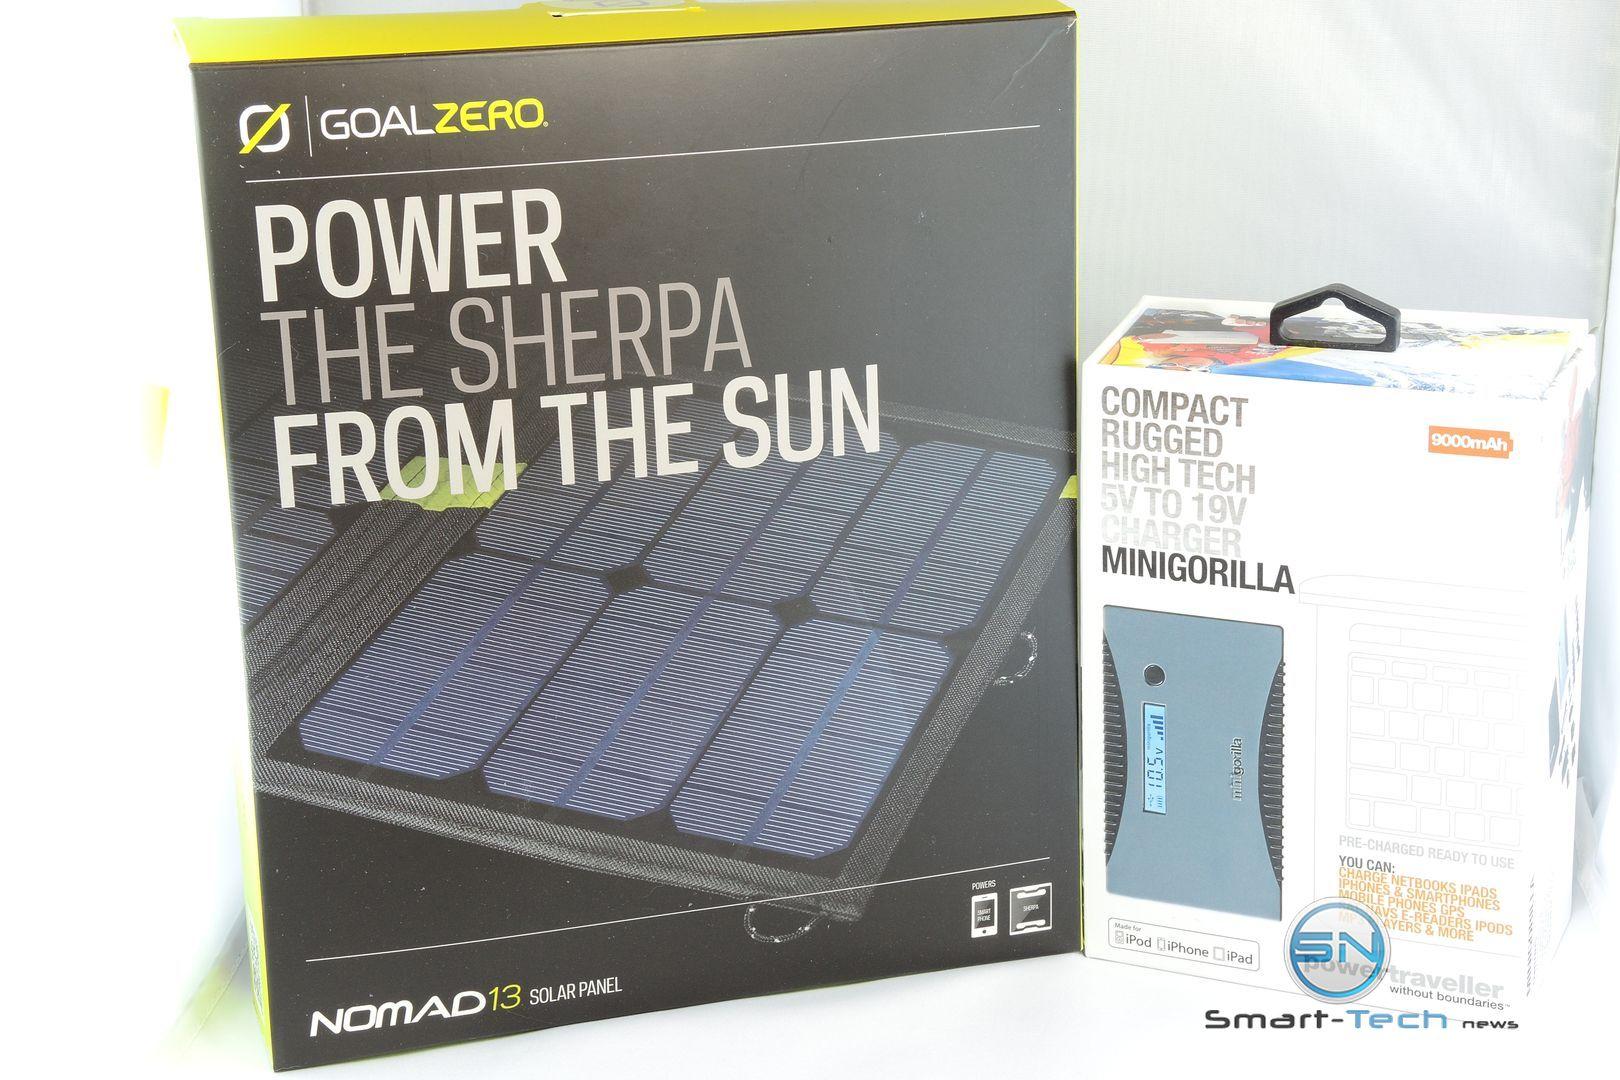 Solarbag Goalzero Nomad 13 Solarpanel Powertraveller 9000mAh Minigorilla Powerbank